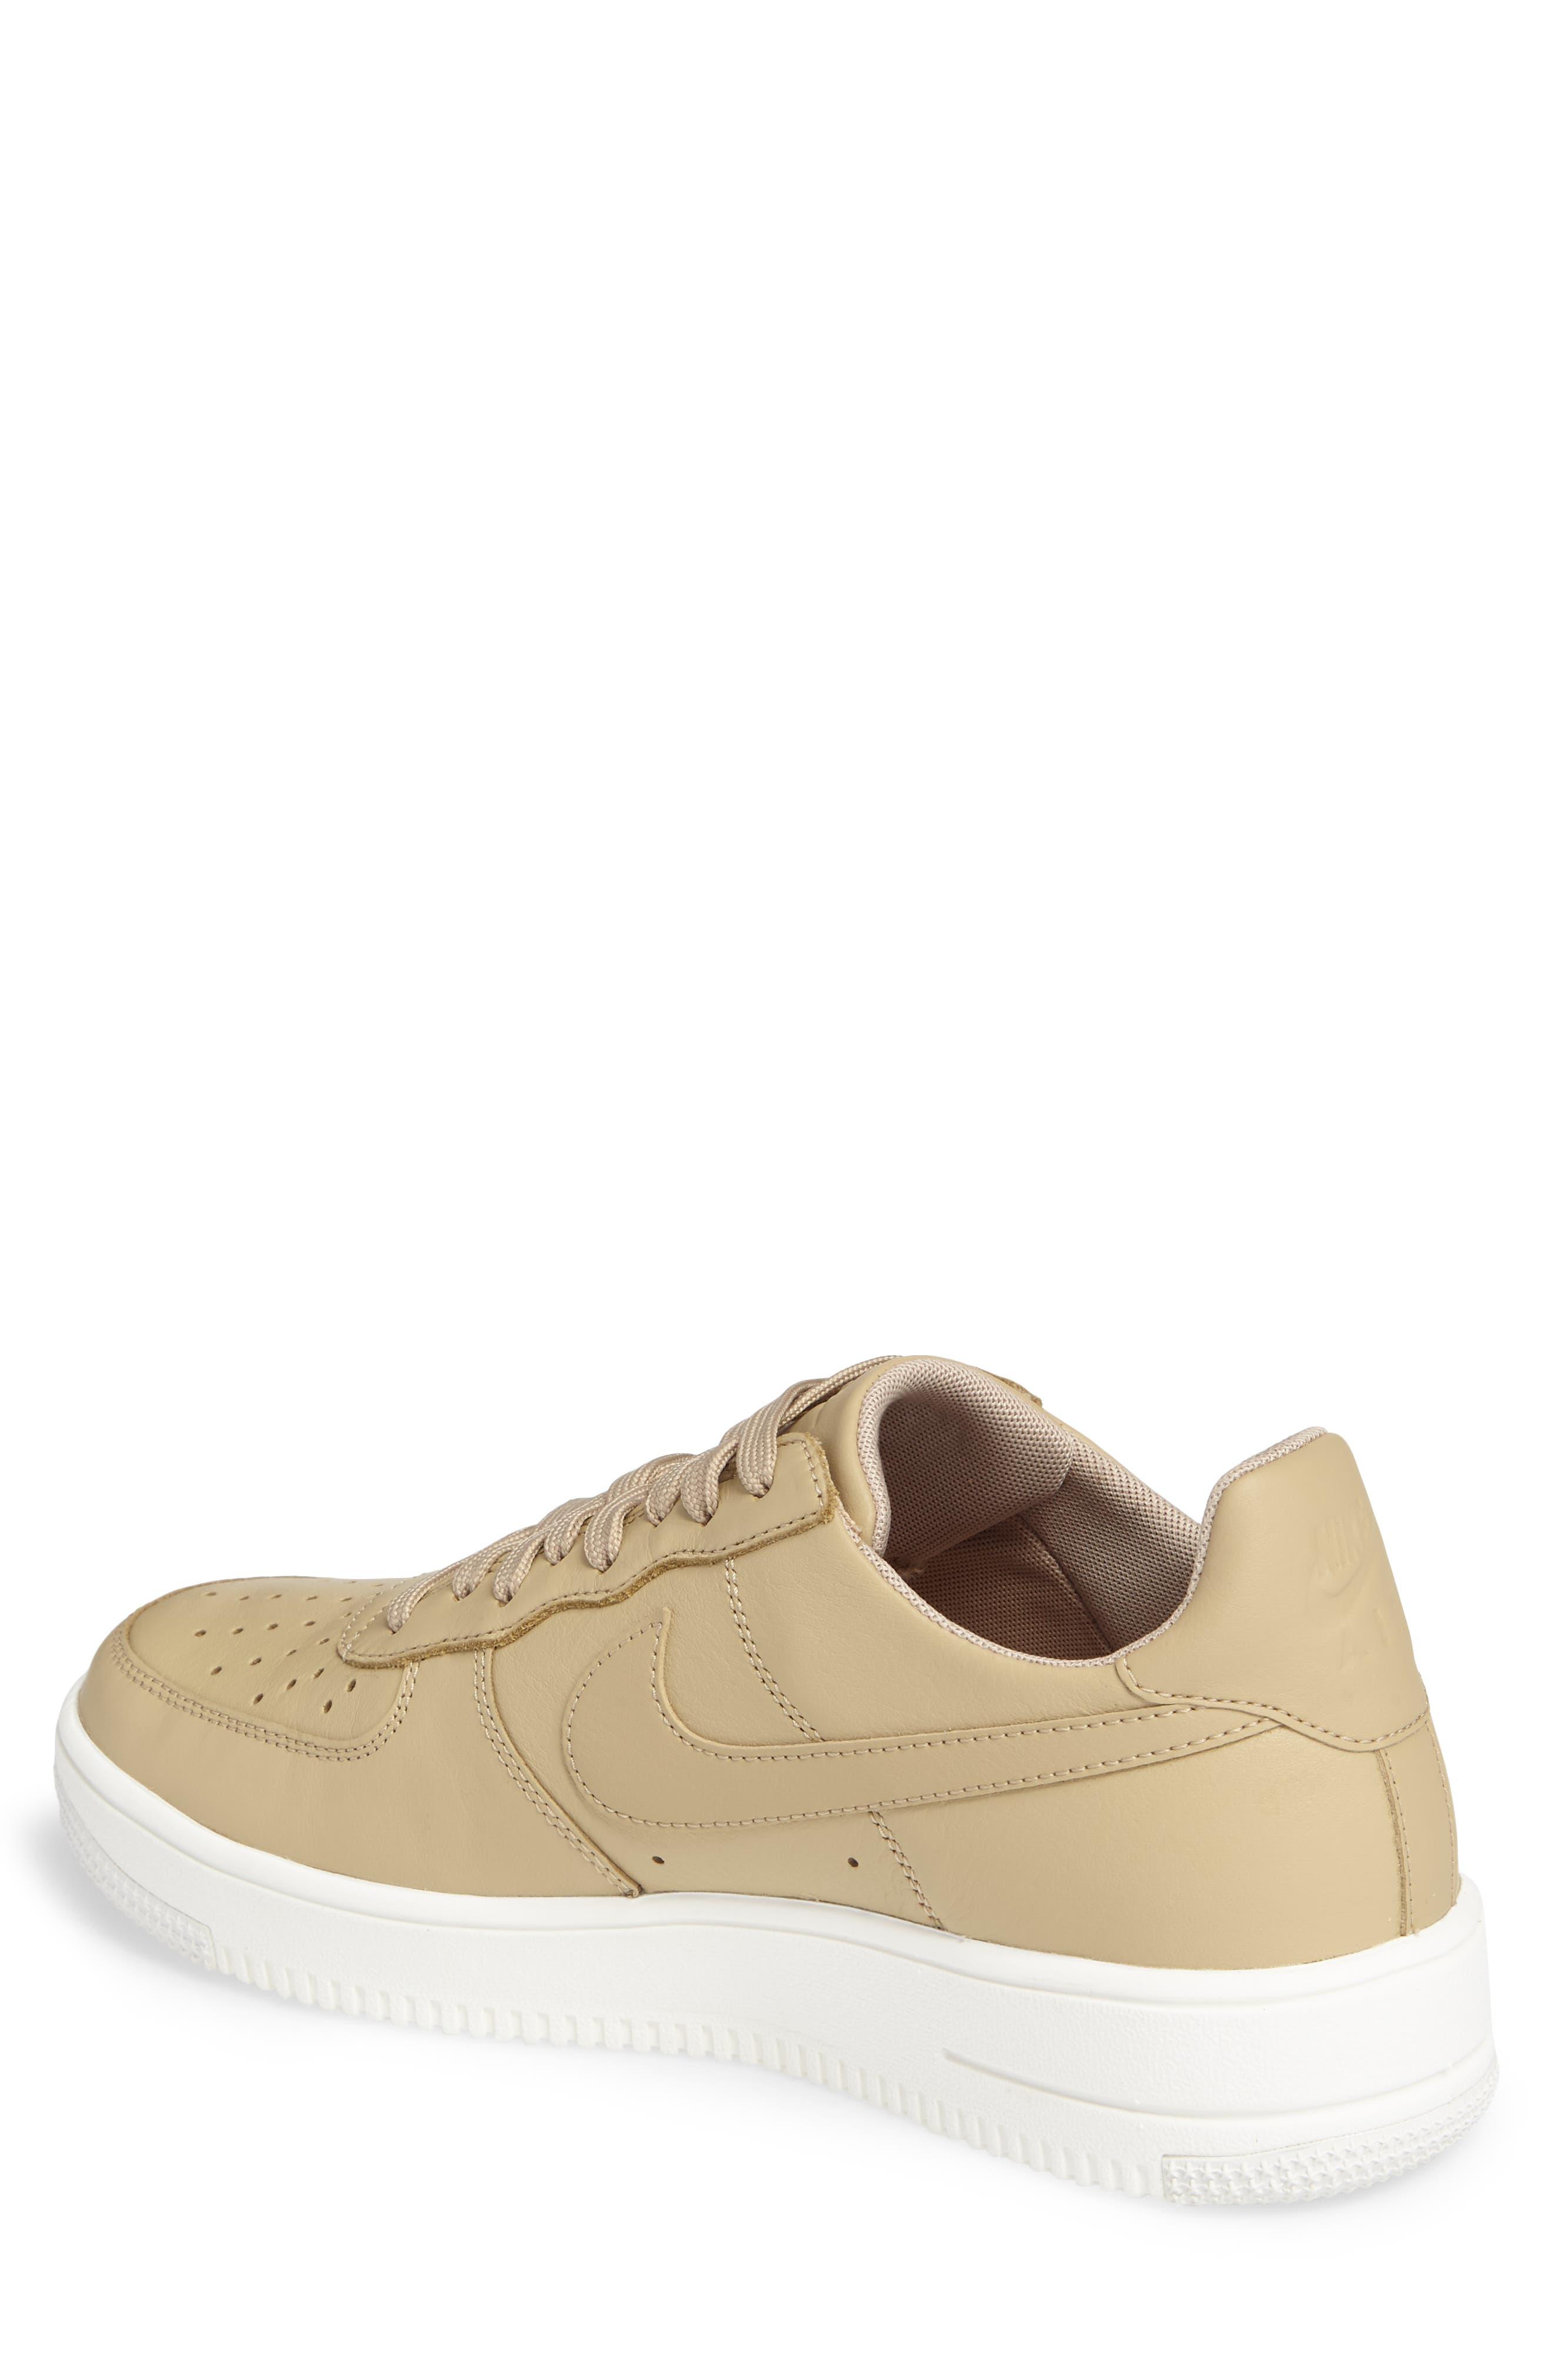 Air Force 1 Ultraforce Sneaker,                             Alternate thumbnail 7, color,